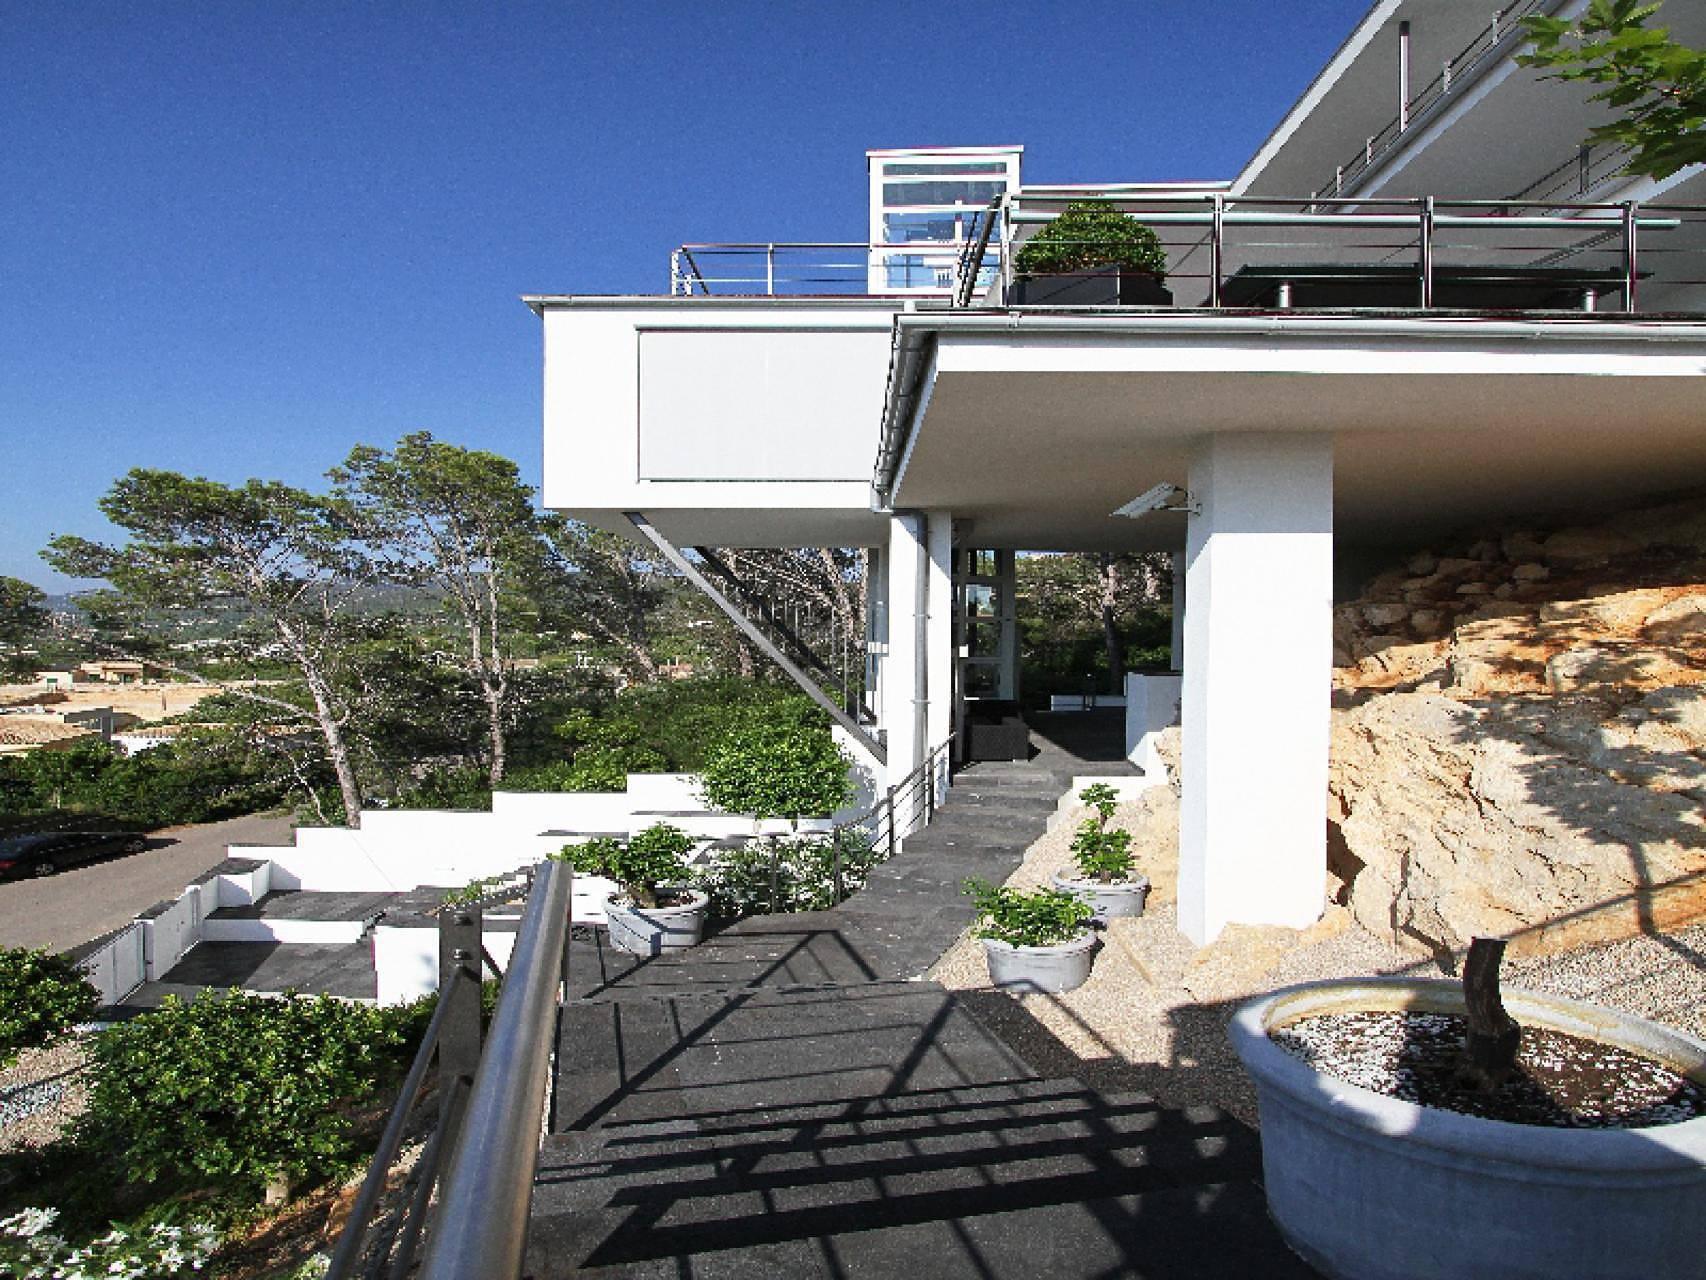 01-04 Bauhaus Villa Mallorca Südwesten Bild 12